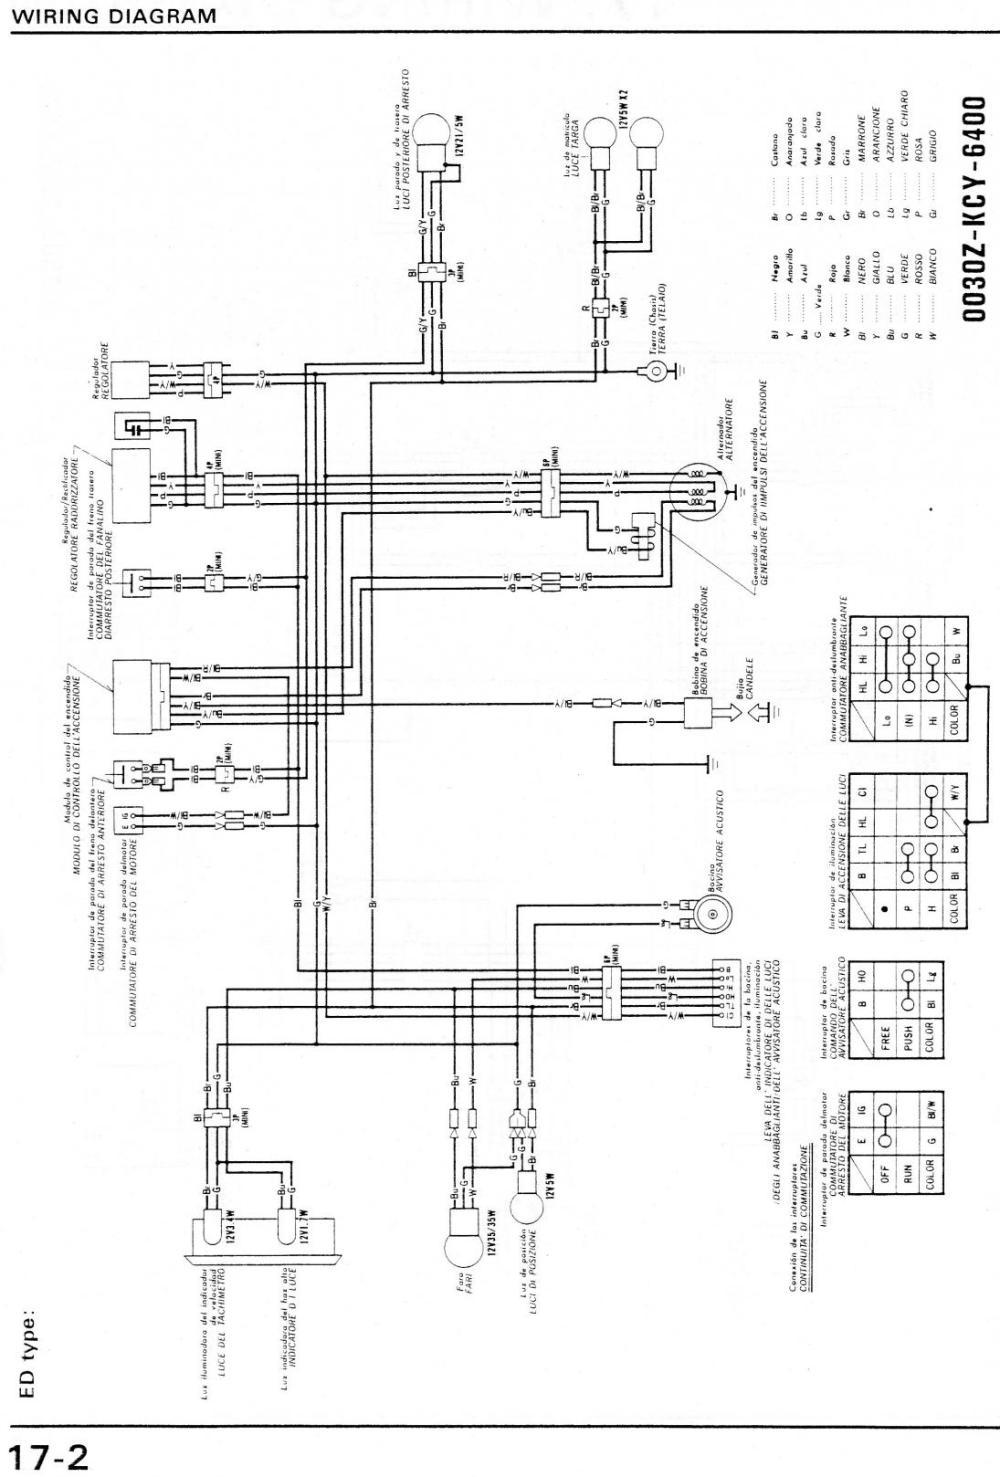 medium resolution of mitsubishi l200 alternator wiring diagram 41 wiring farmtrac tractor wiring diagram mitsubishi wiring diagrams tractor d2000ii